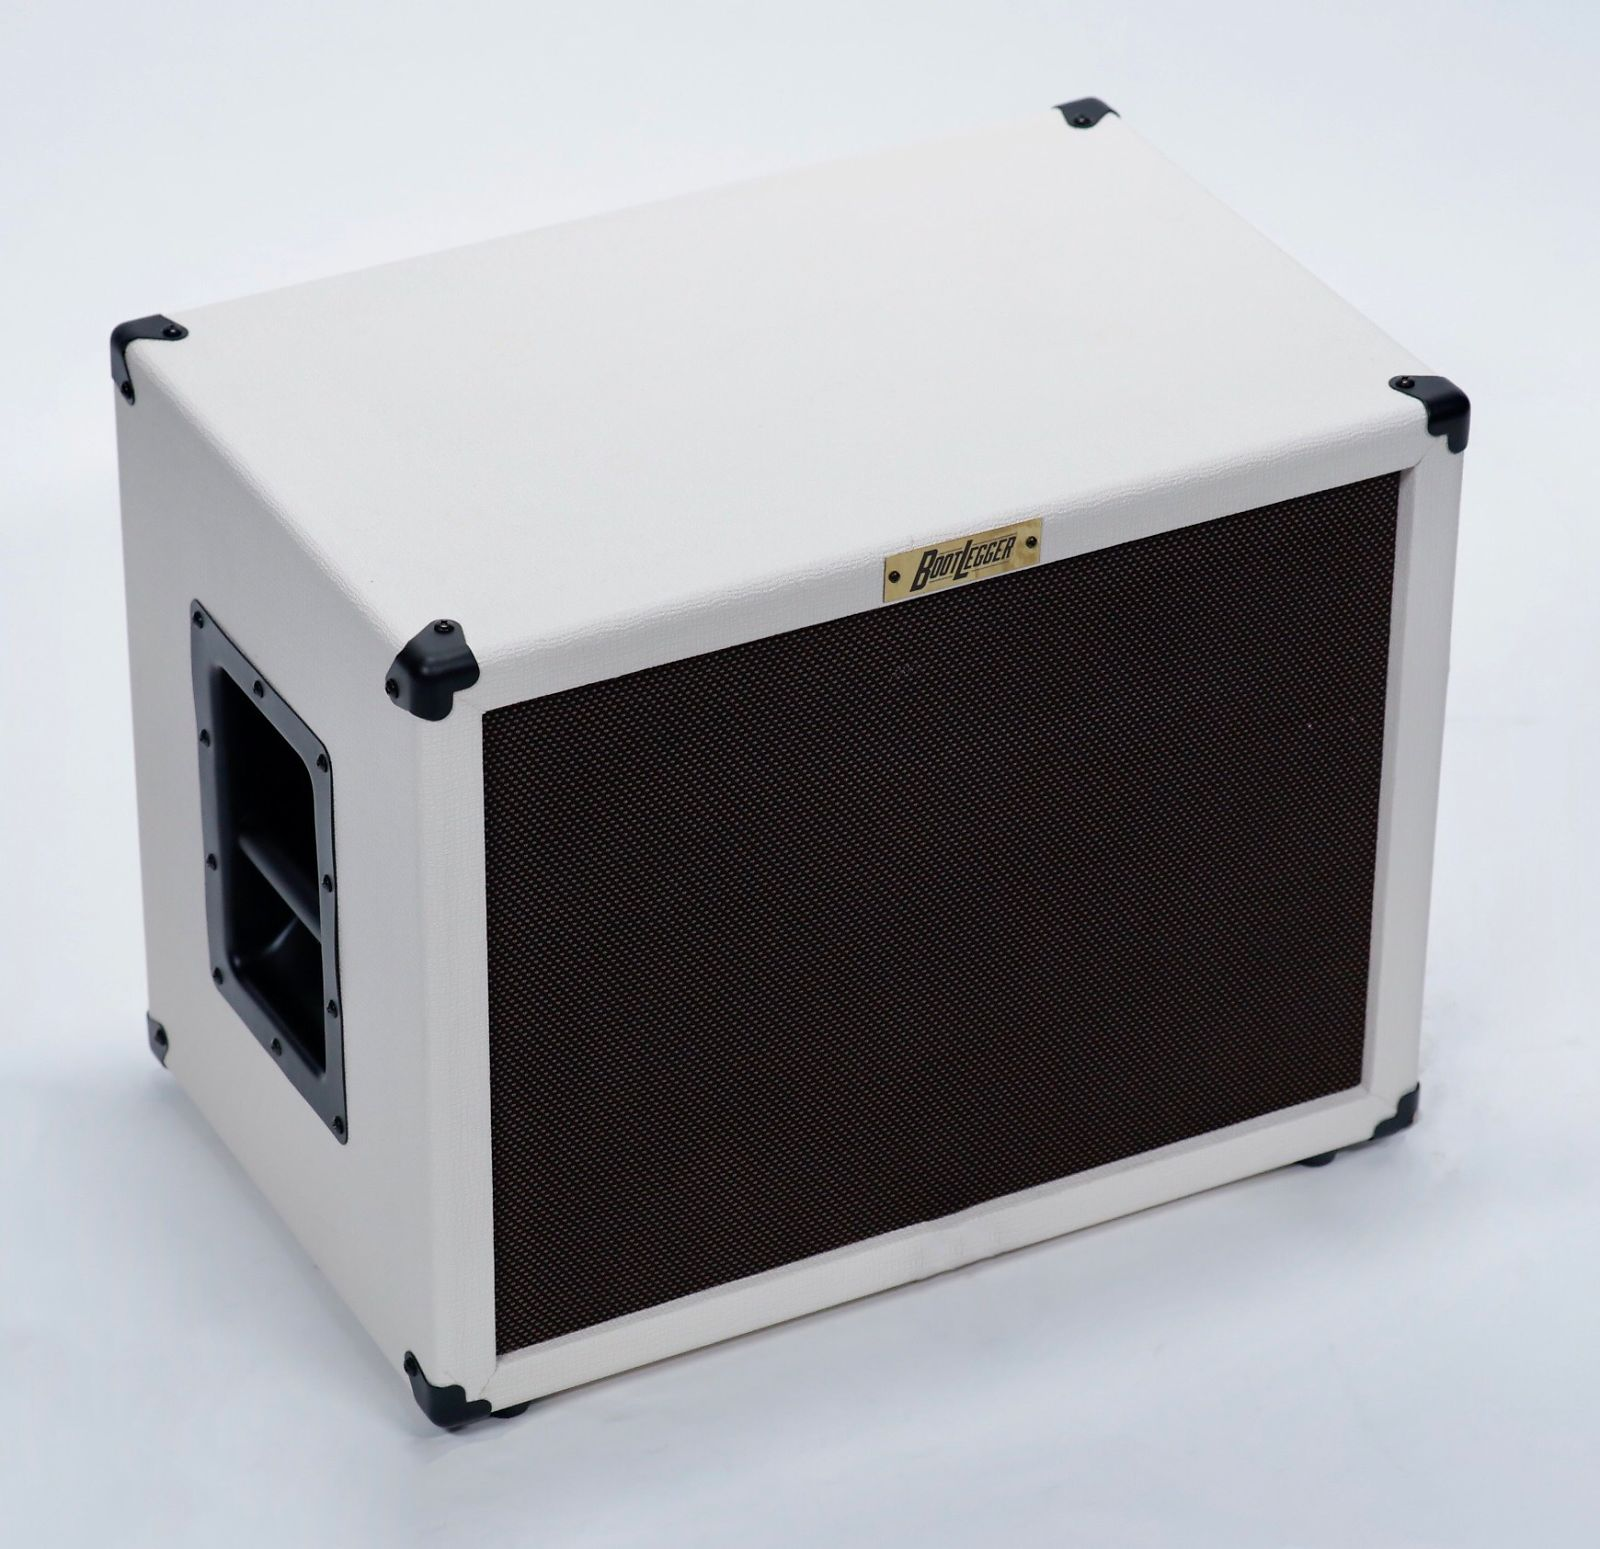 Bootlegger Blues 30 1x12 Eminence closed back wide body cabinet 100 watt 8 ohm